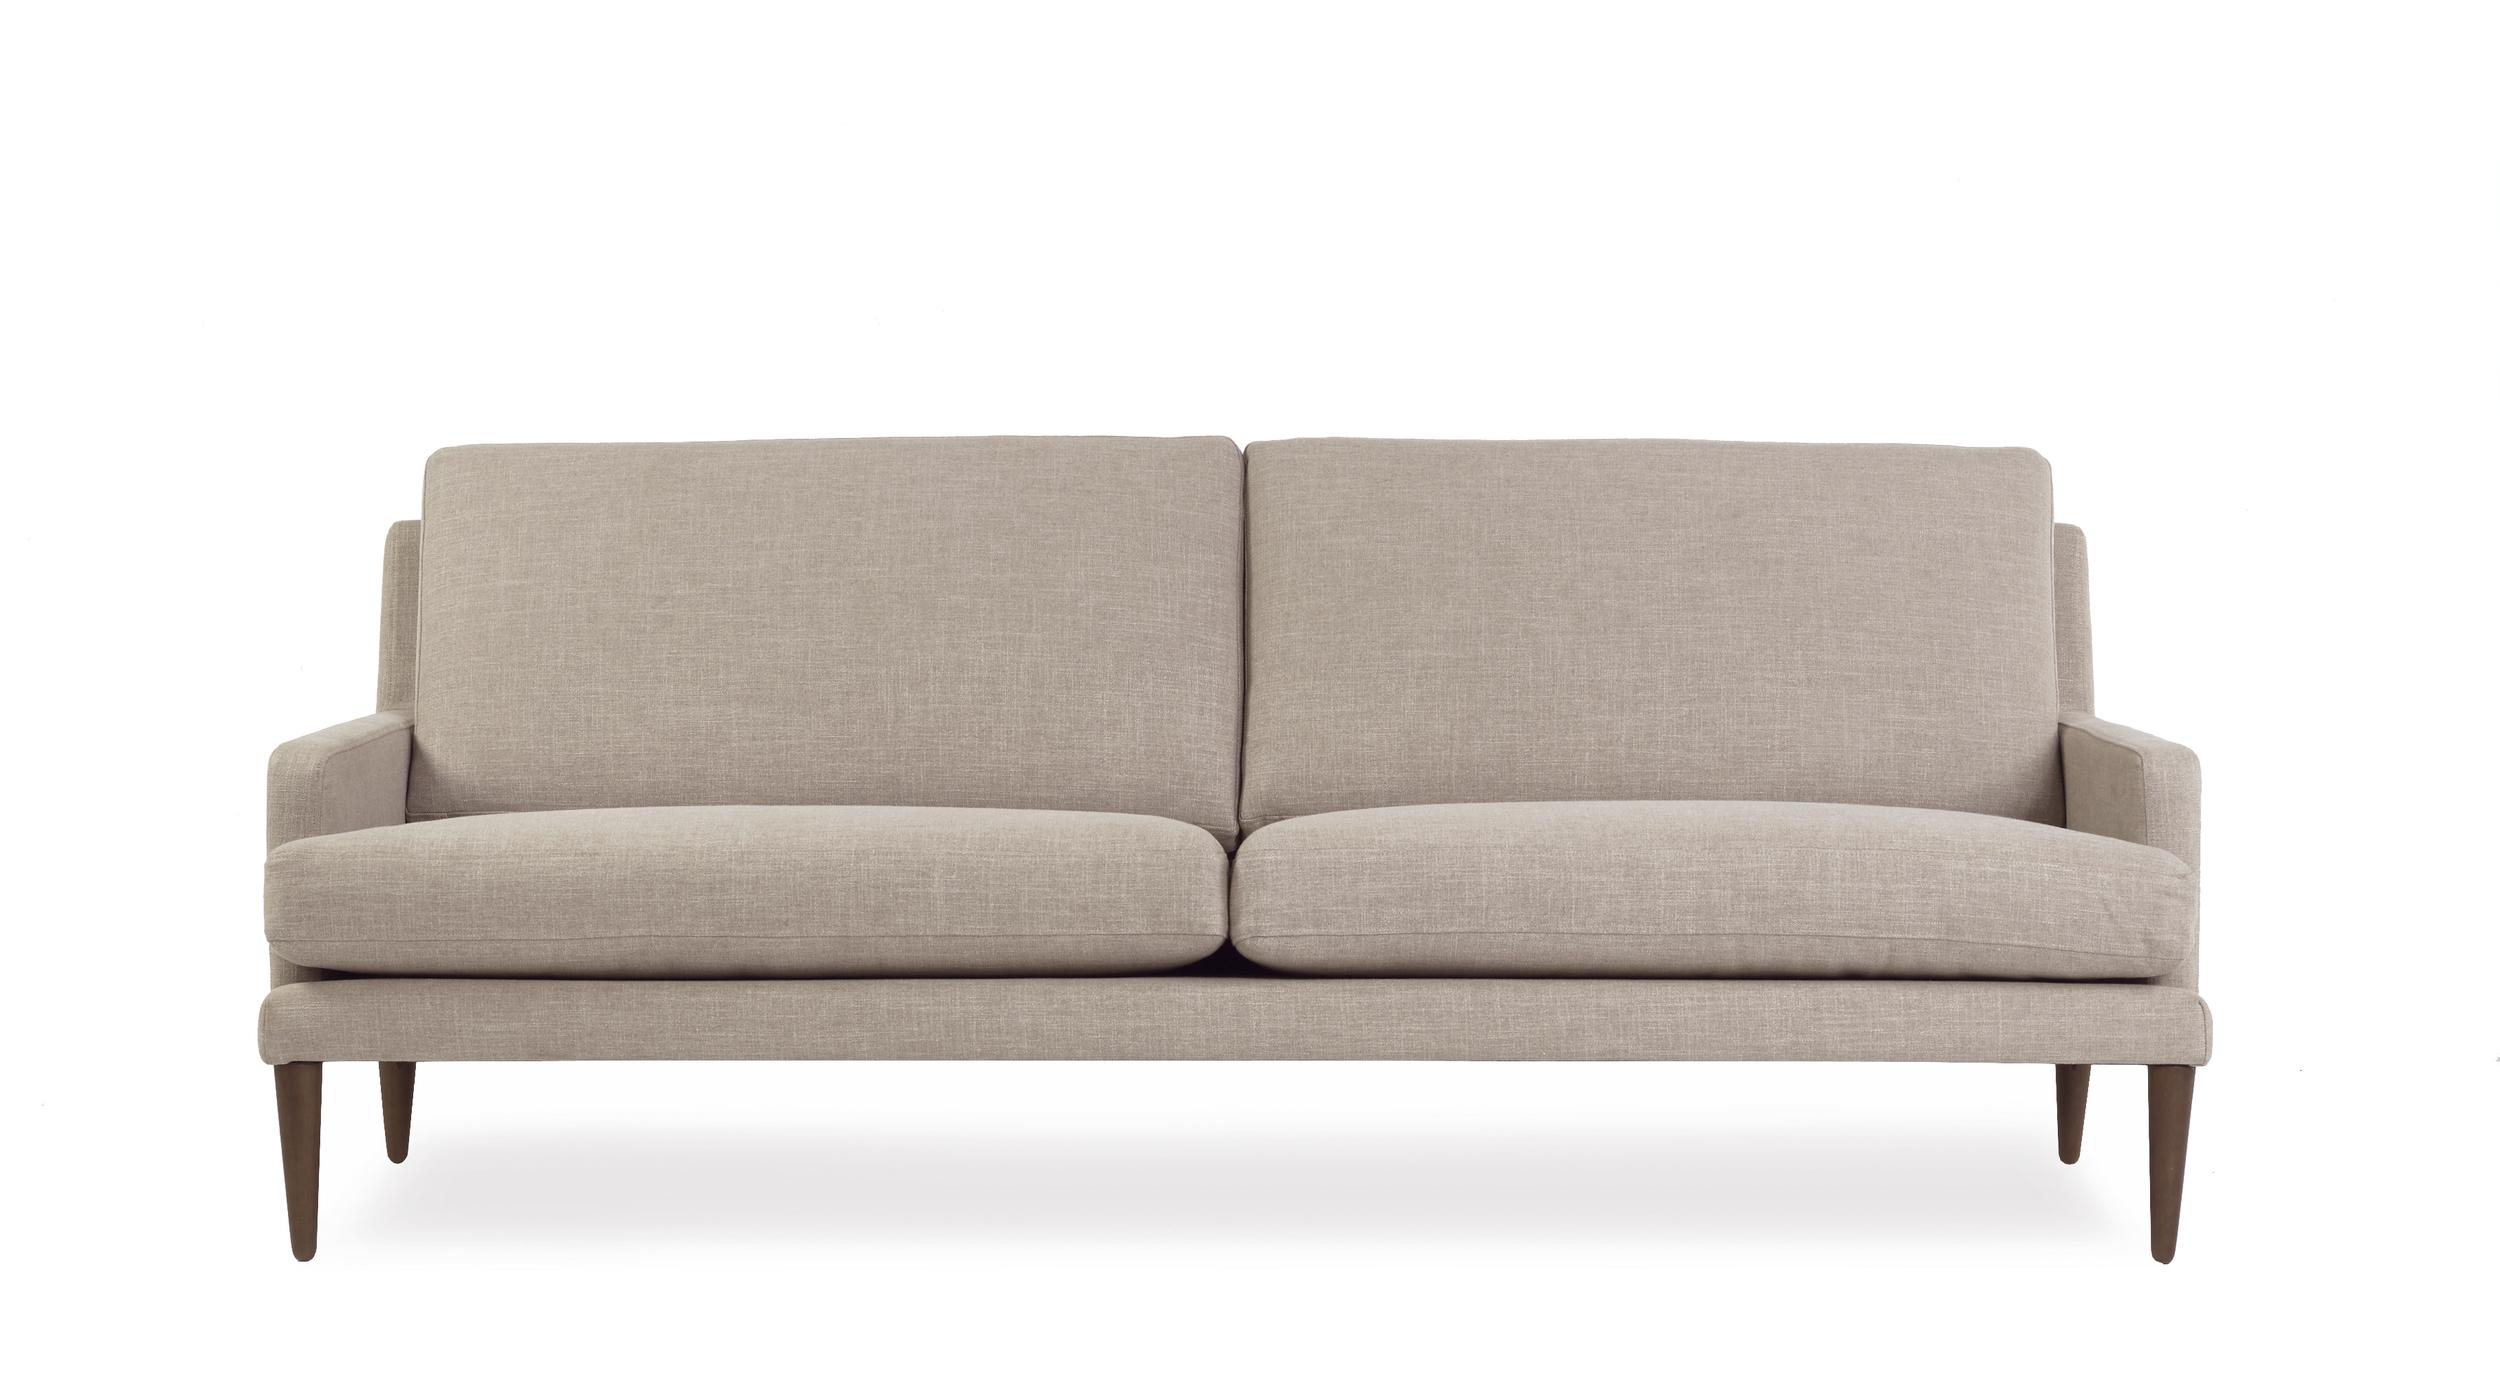 Brooklyn 3 seater sofa in neutral beige skin colour